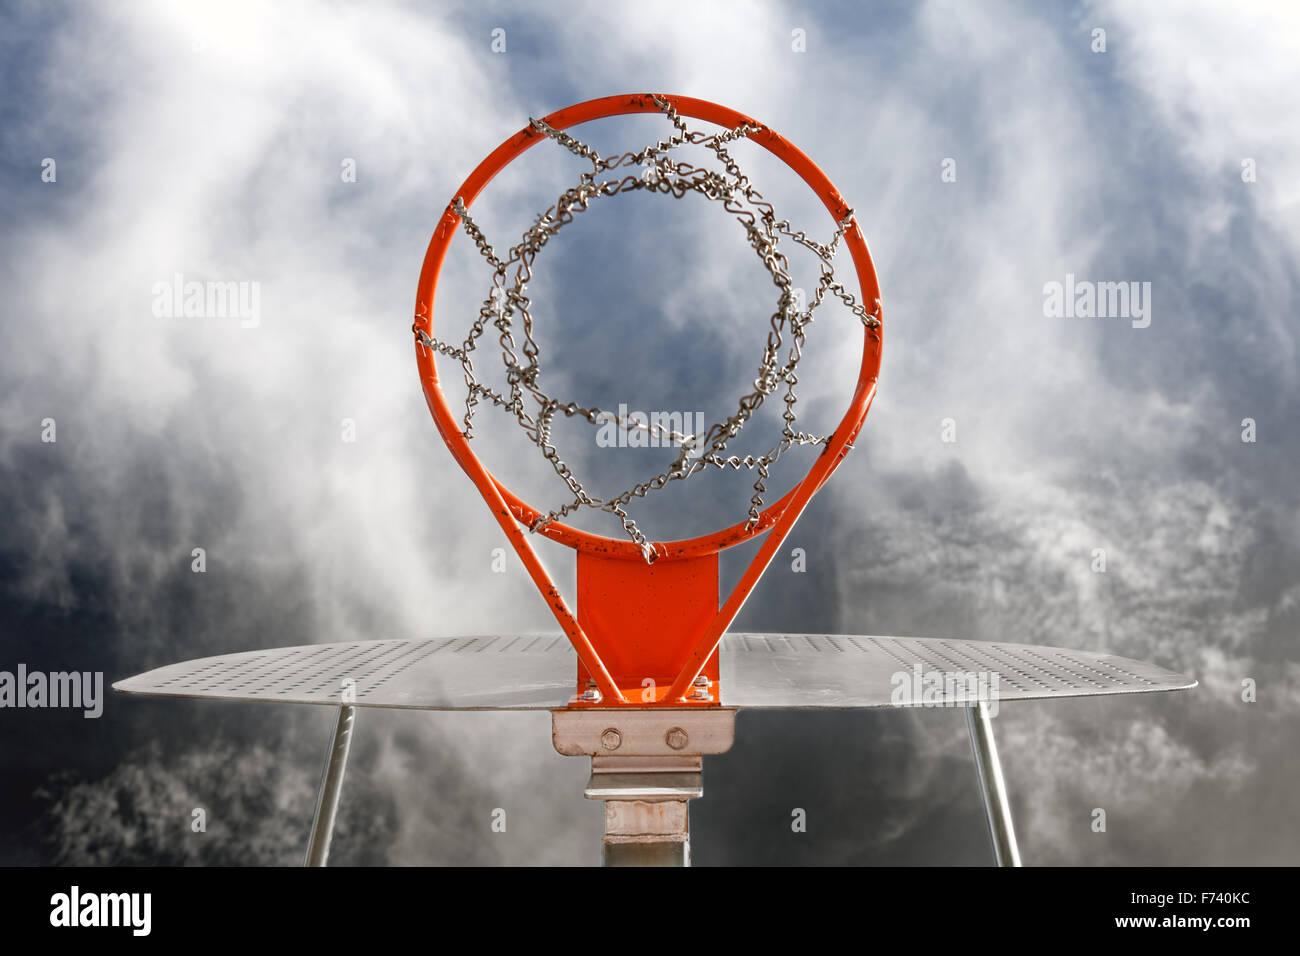 Abstraktes Bild von Basketball-Tor gegen den Himmel Stockfoto